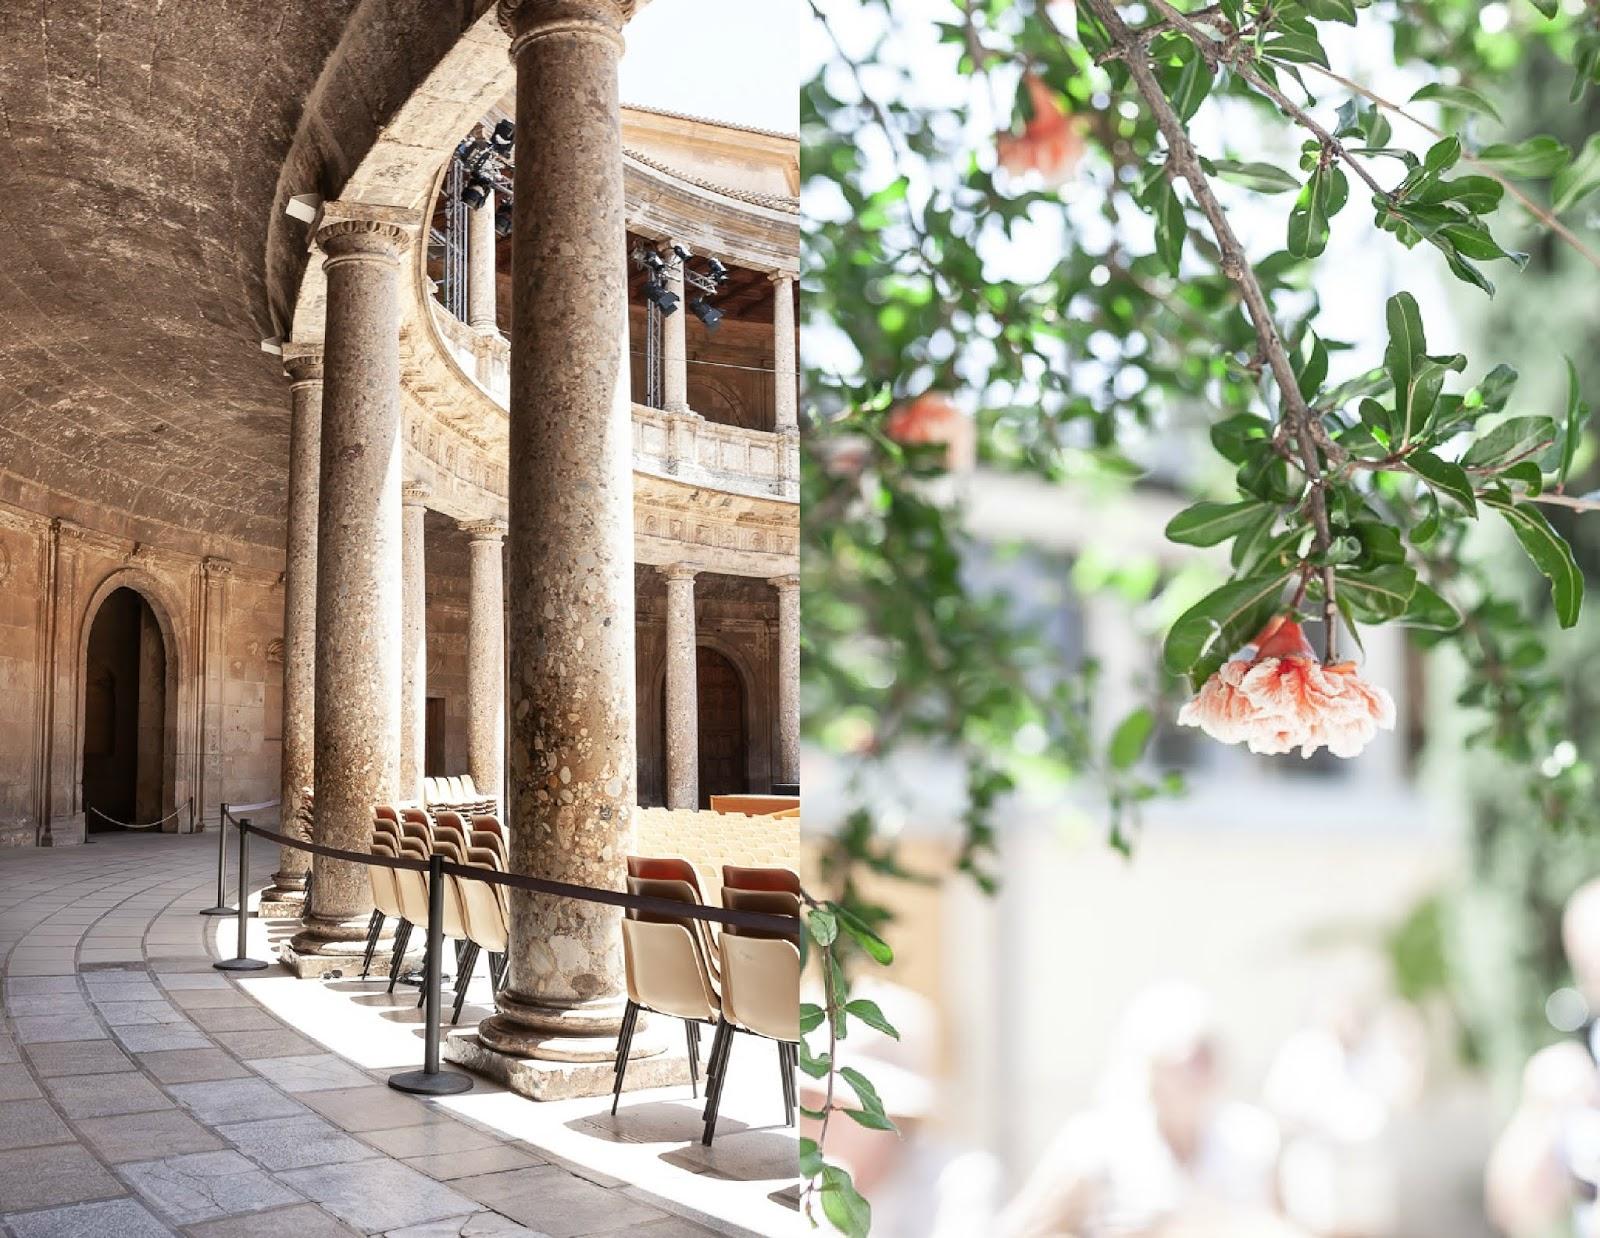 Pomegranate of Alhambra